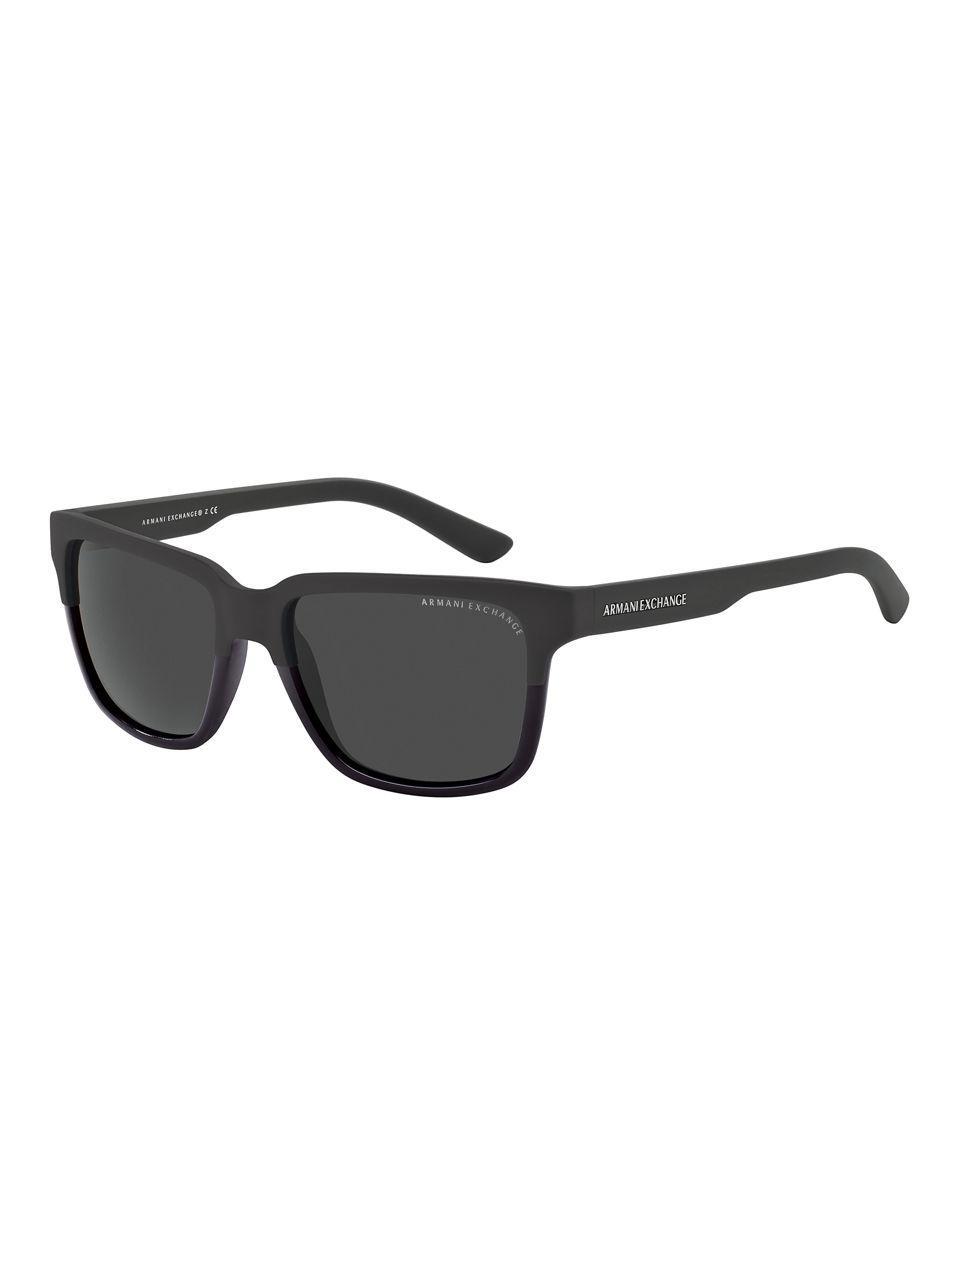 248e08064cb Armani Exchange Wayfarer Sunglasses in Black for Men - Lyst